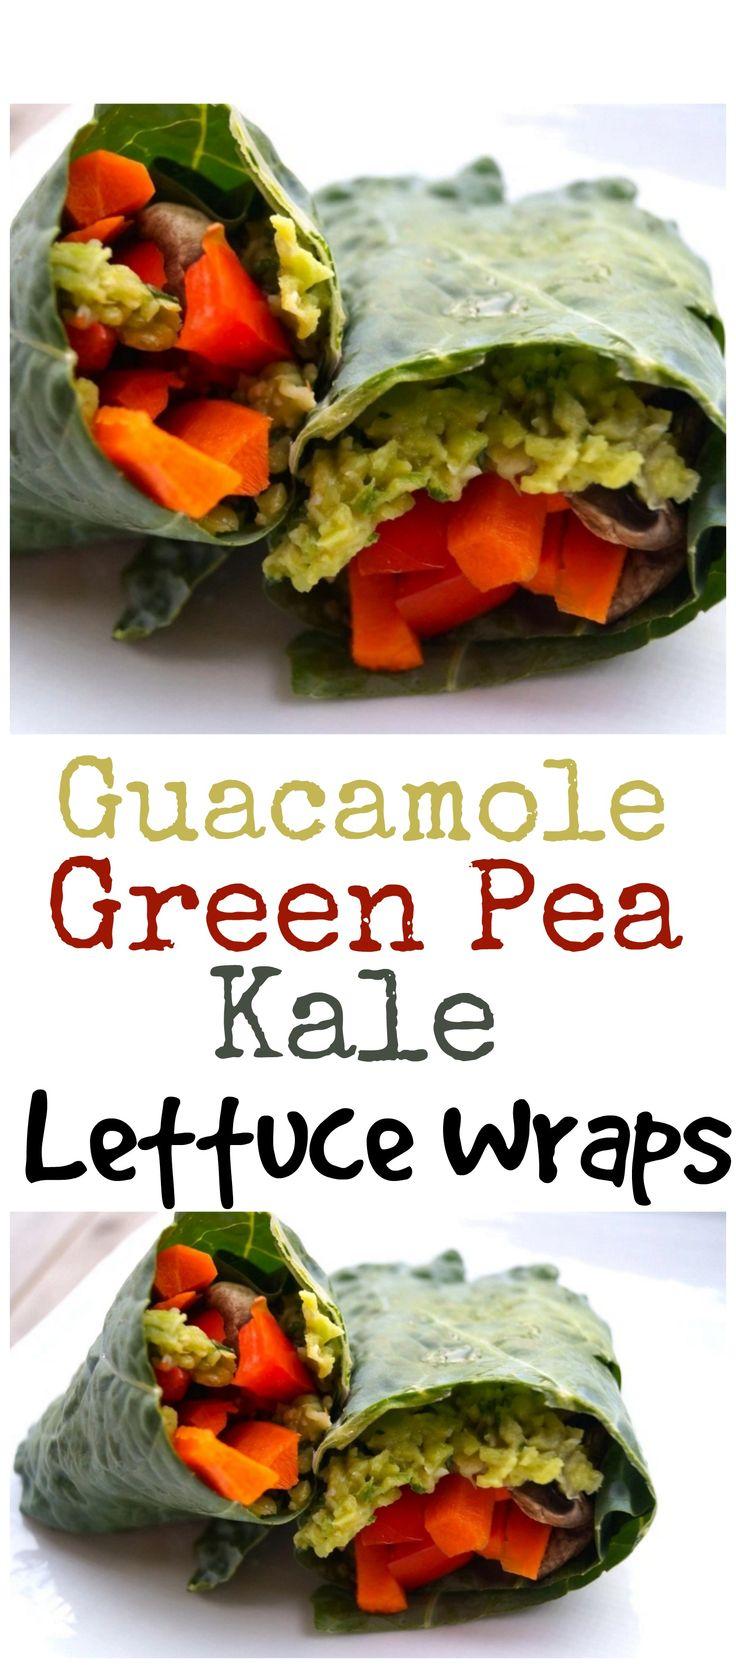 http://www.furtherfood.com/recipe/easy-guacamole-green-pea-kale-lettuce-wraps/